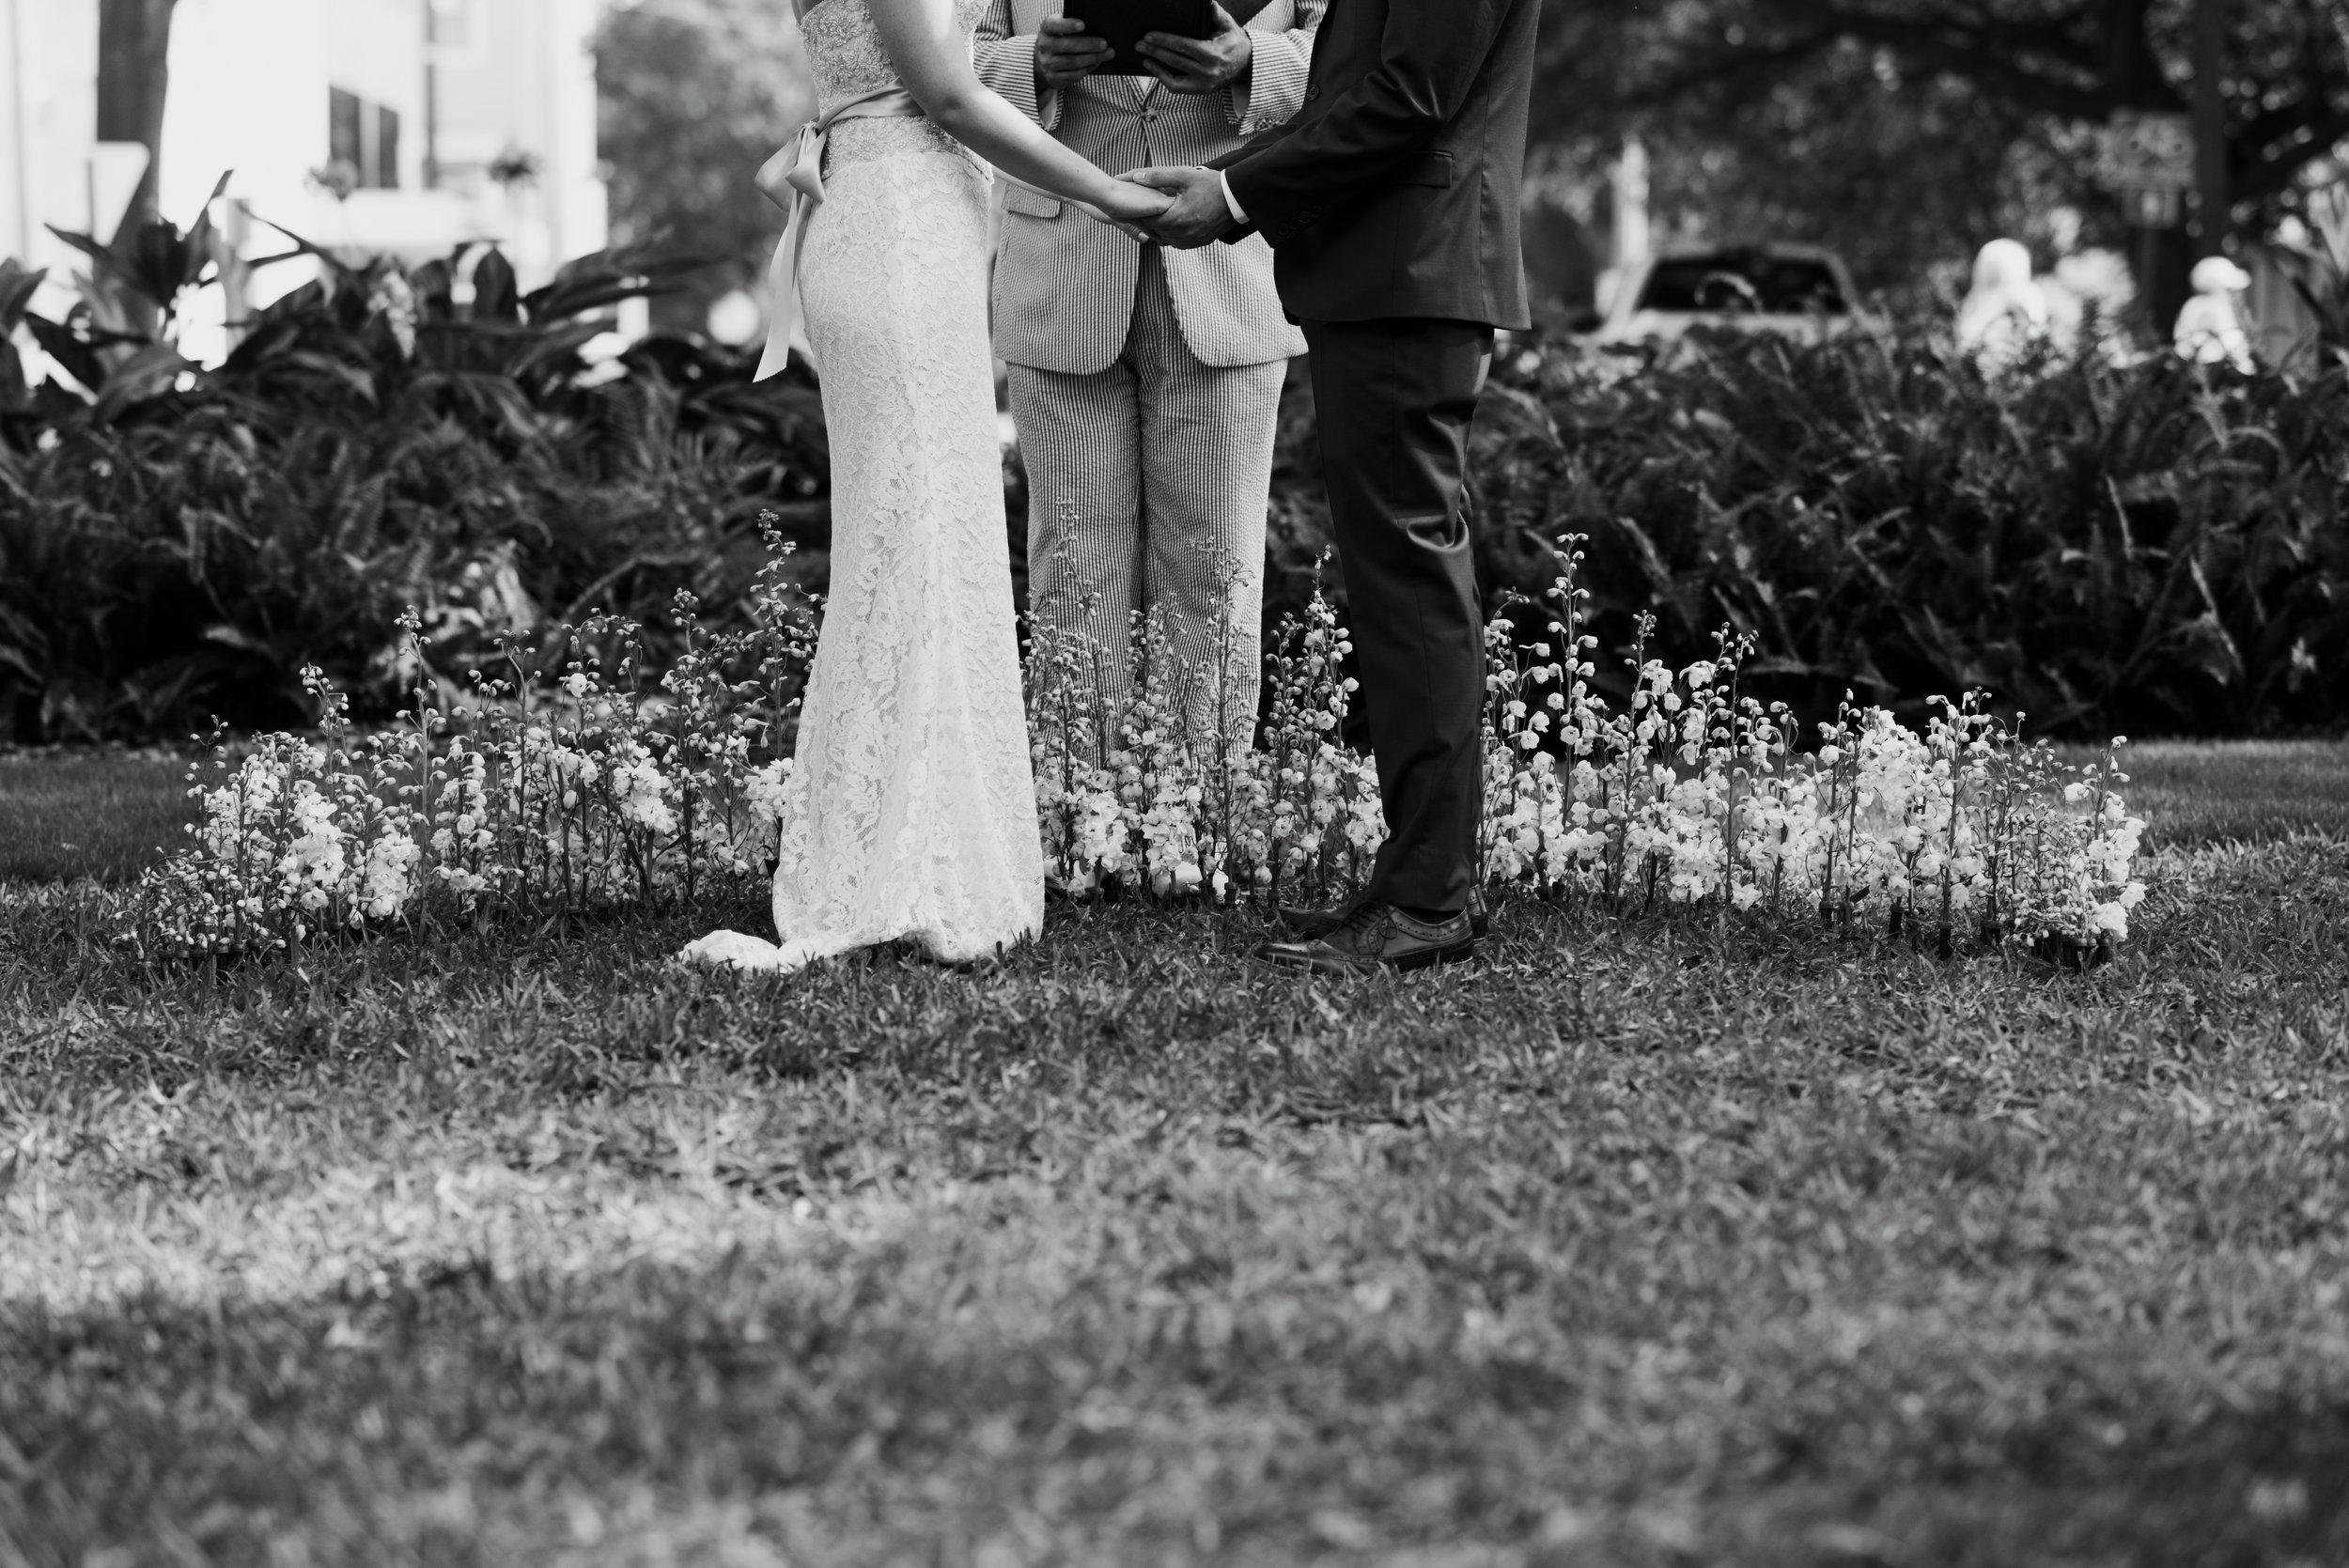 savannah-station-elopement-photographer-savannah-elopement-photography-savannah-georgia-elopement-photographer-savannah-wedding-photographer-meg-hill-photo-jade-hill- (65 of 93).jpg